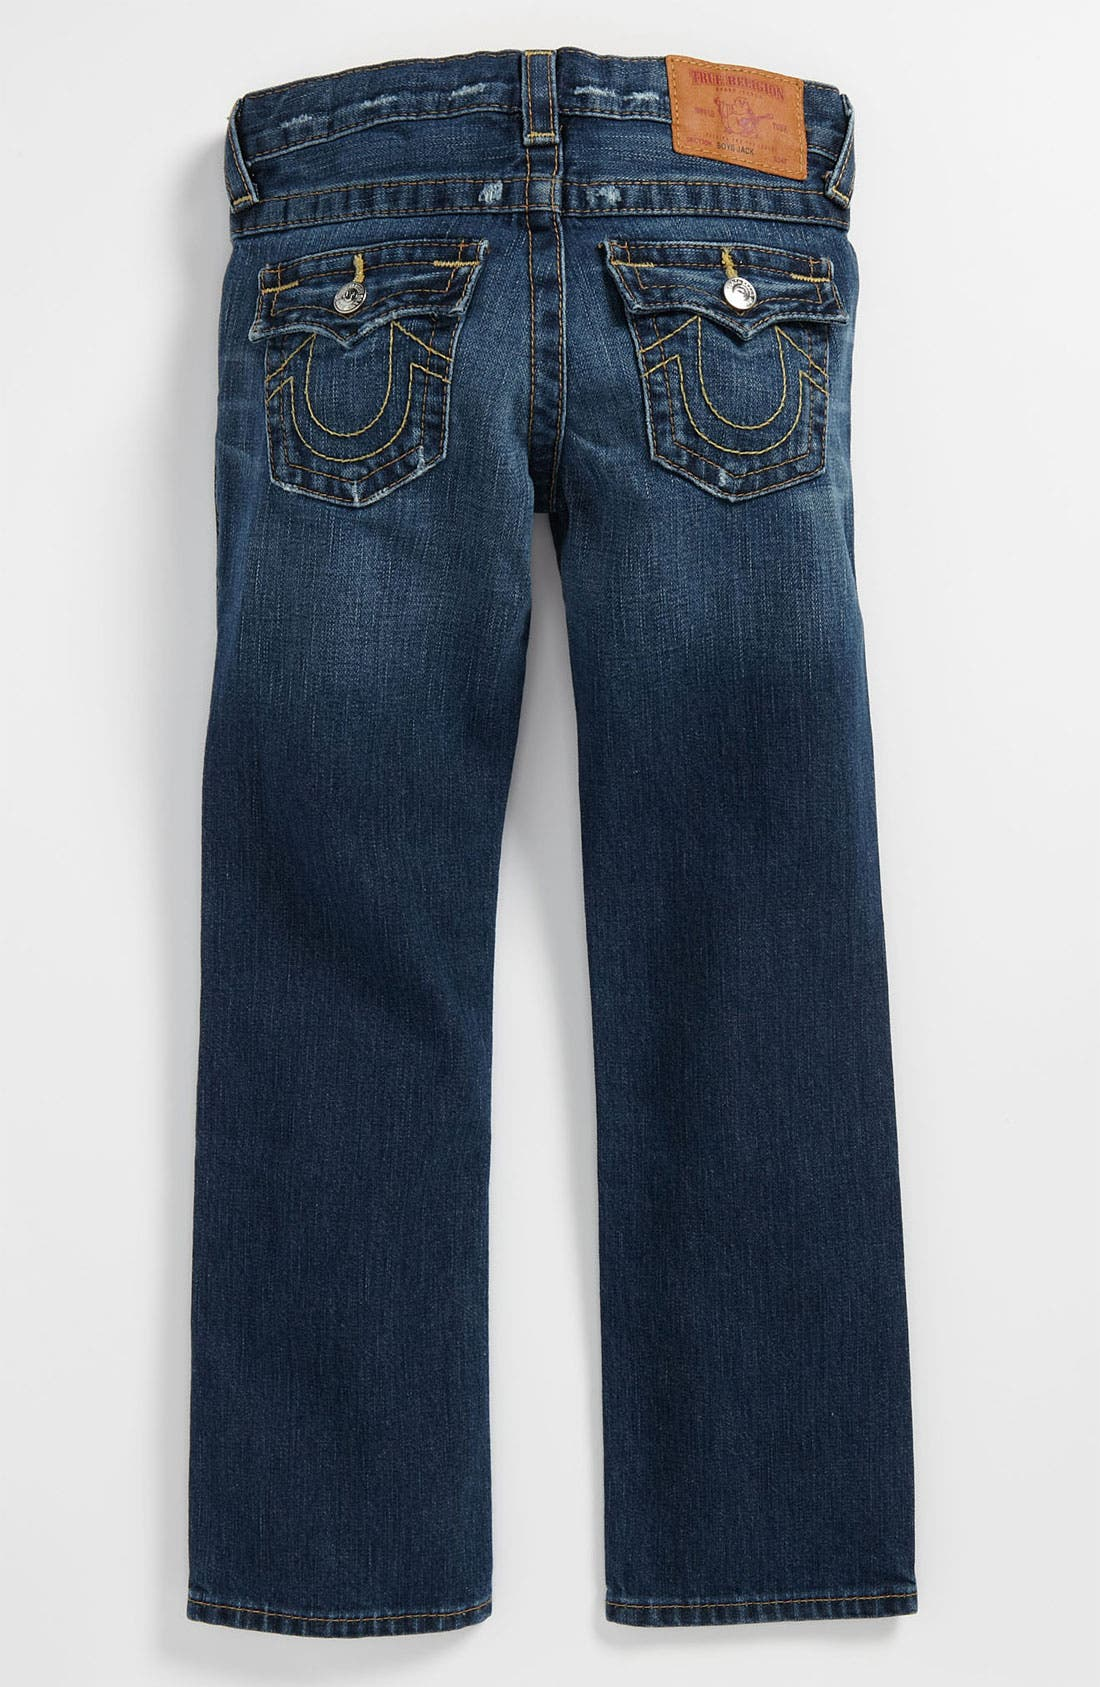 Main Image - True Religion Brand Jeans 'Jack Rip & Repair' Jeans (Little Boys)